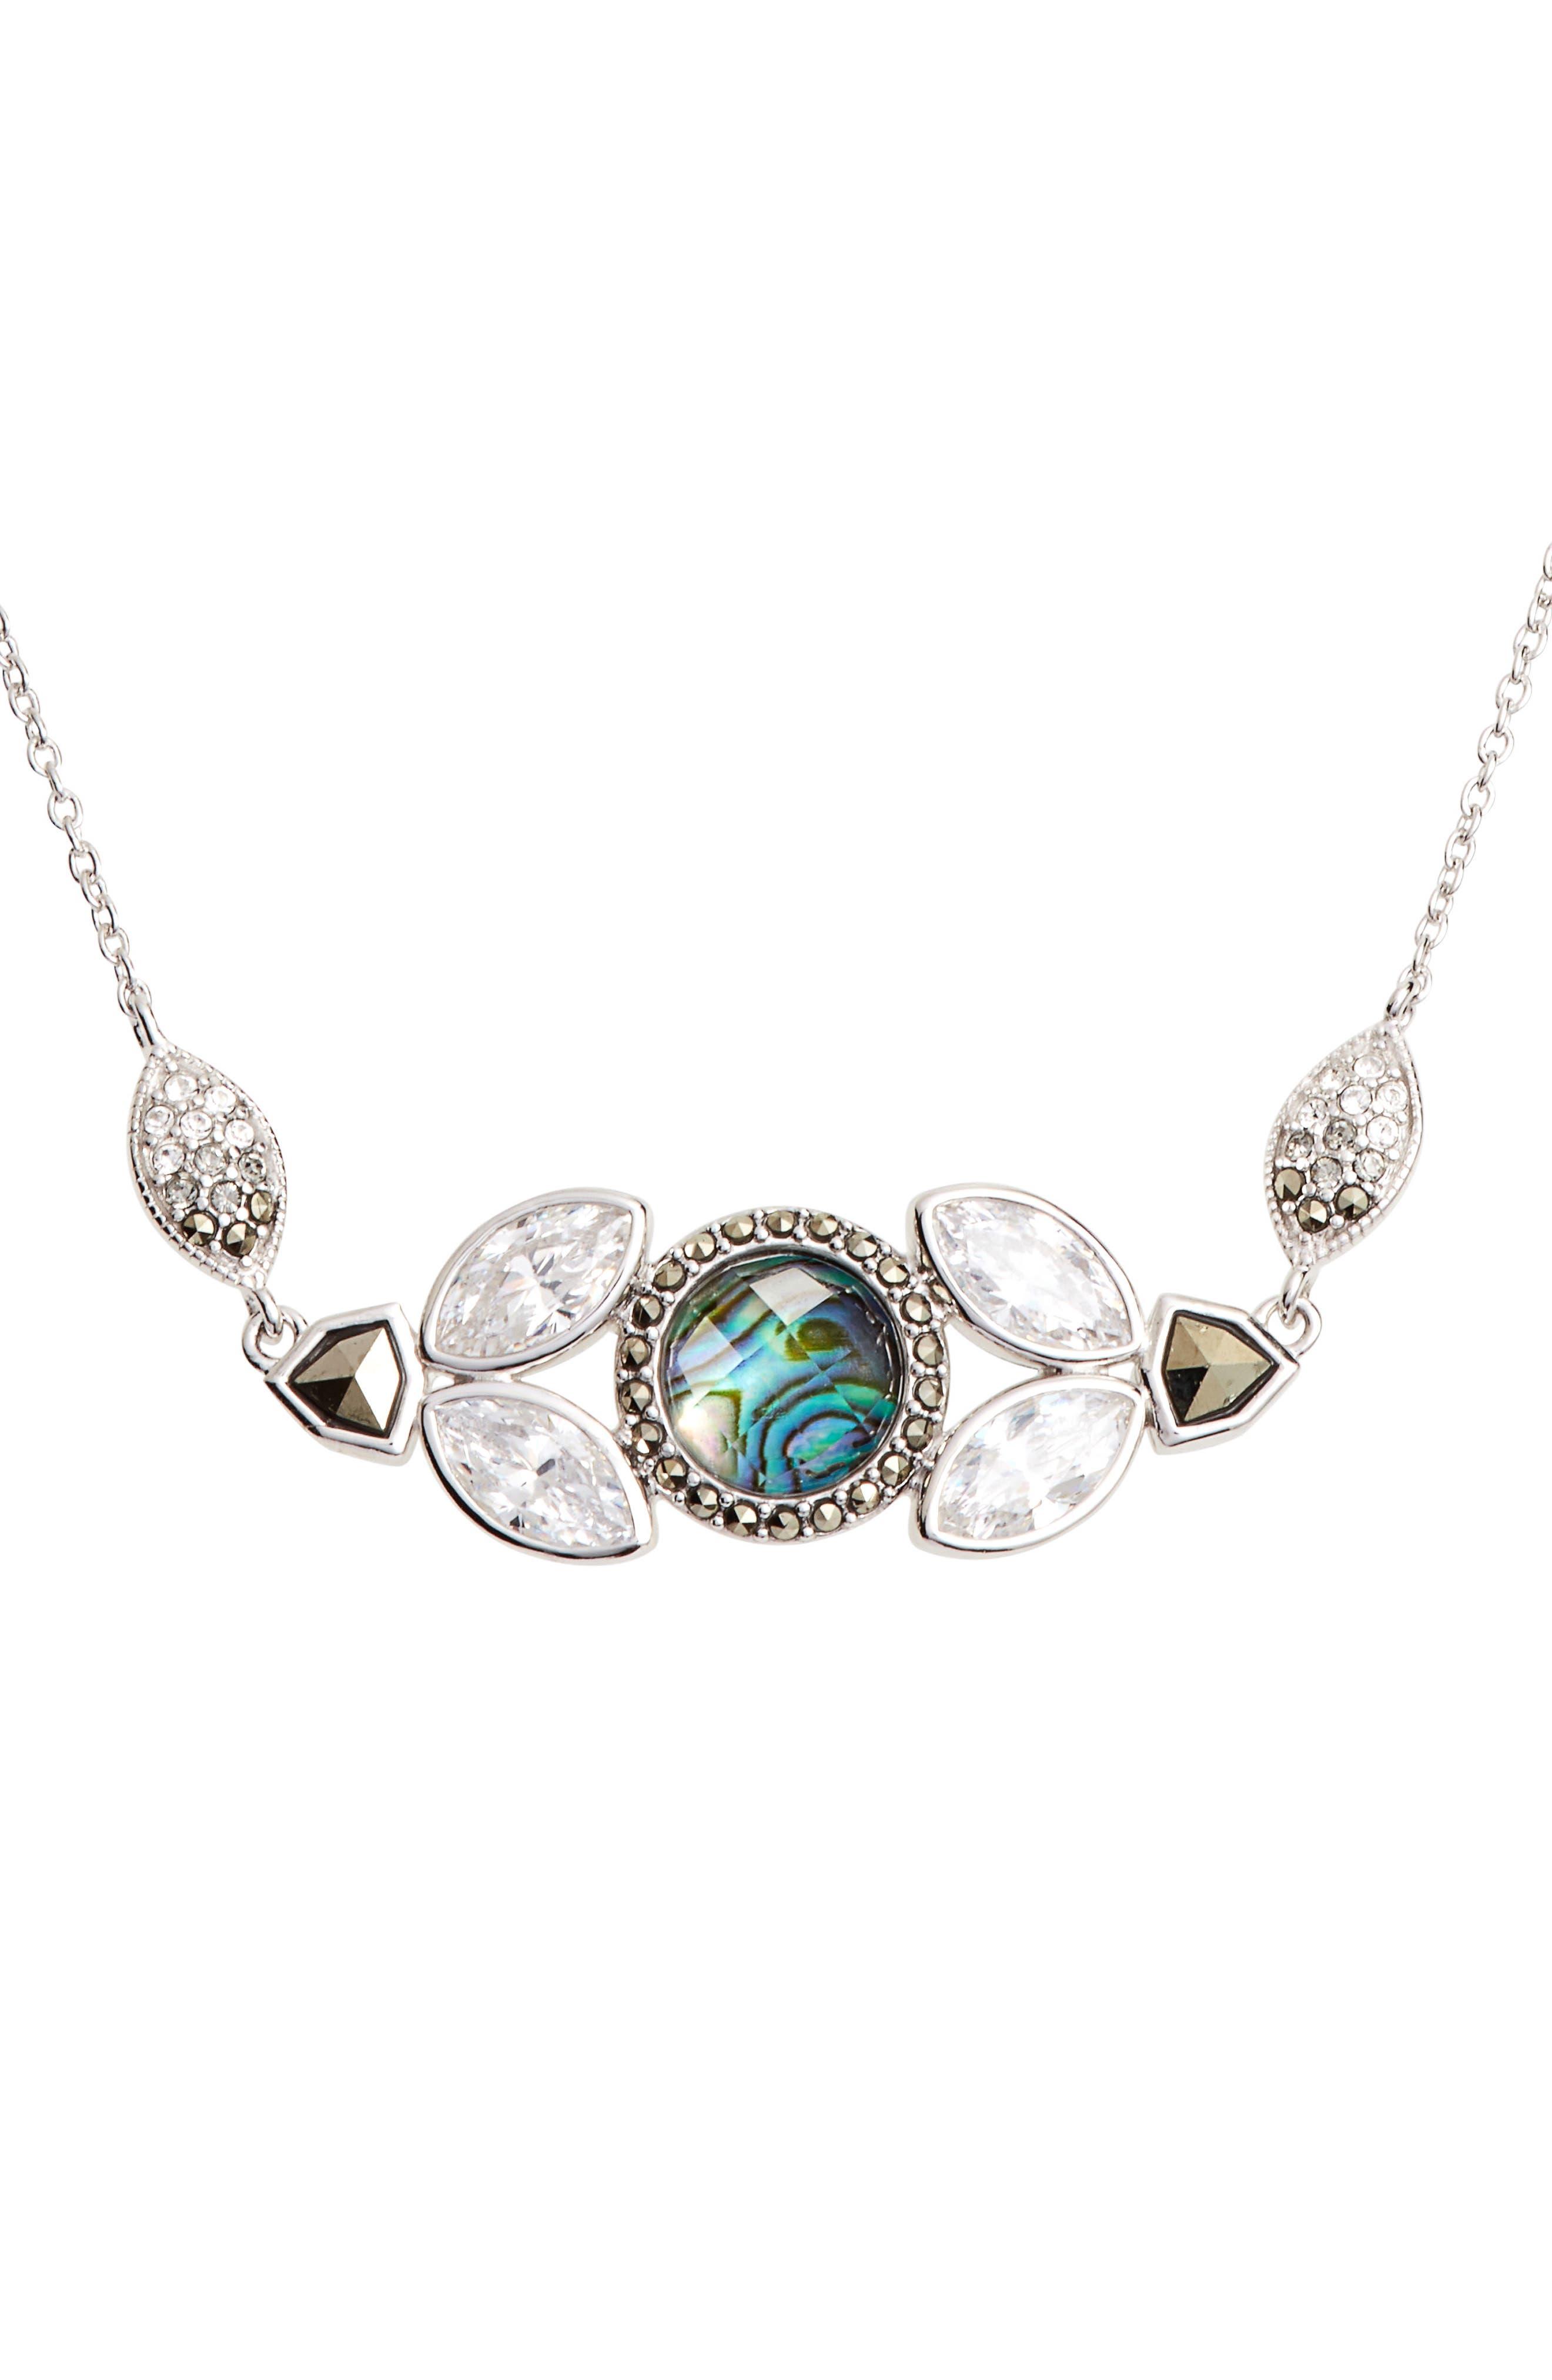 Main Image - Judith Jack Crystal Pendant Necklace